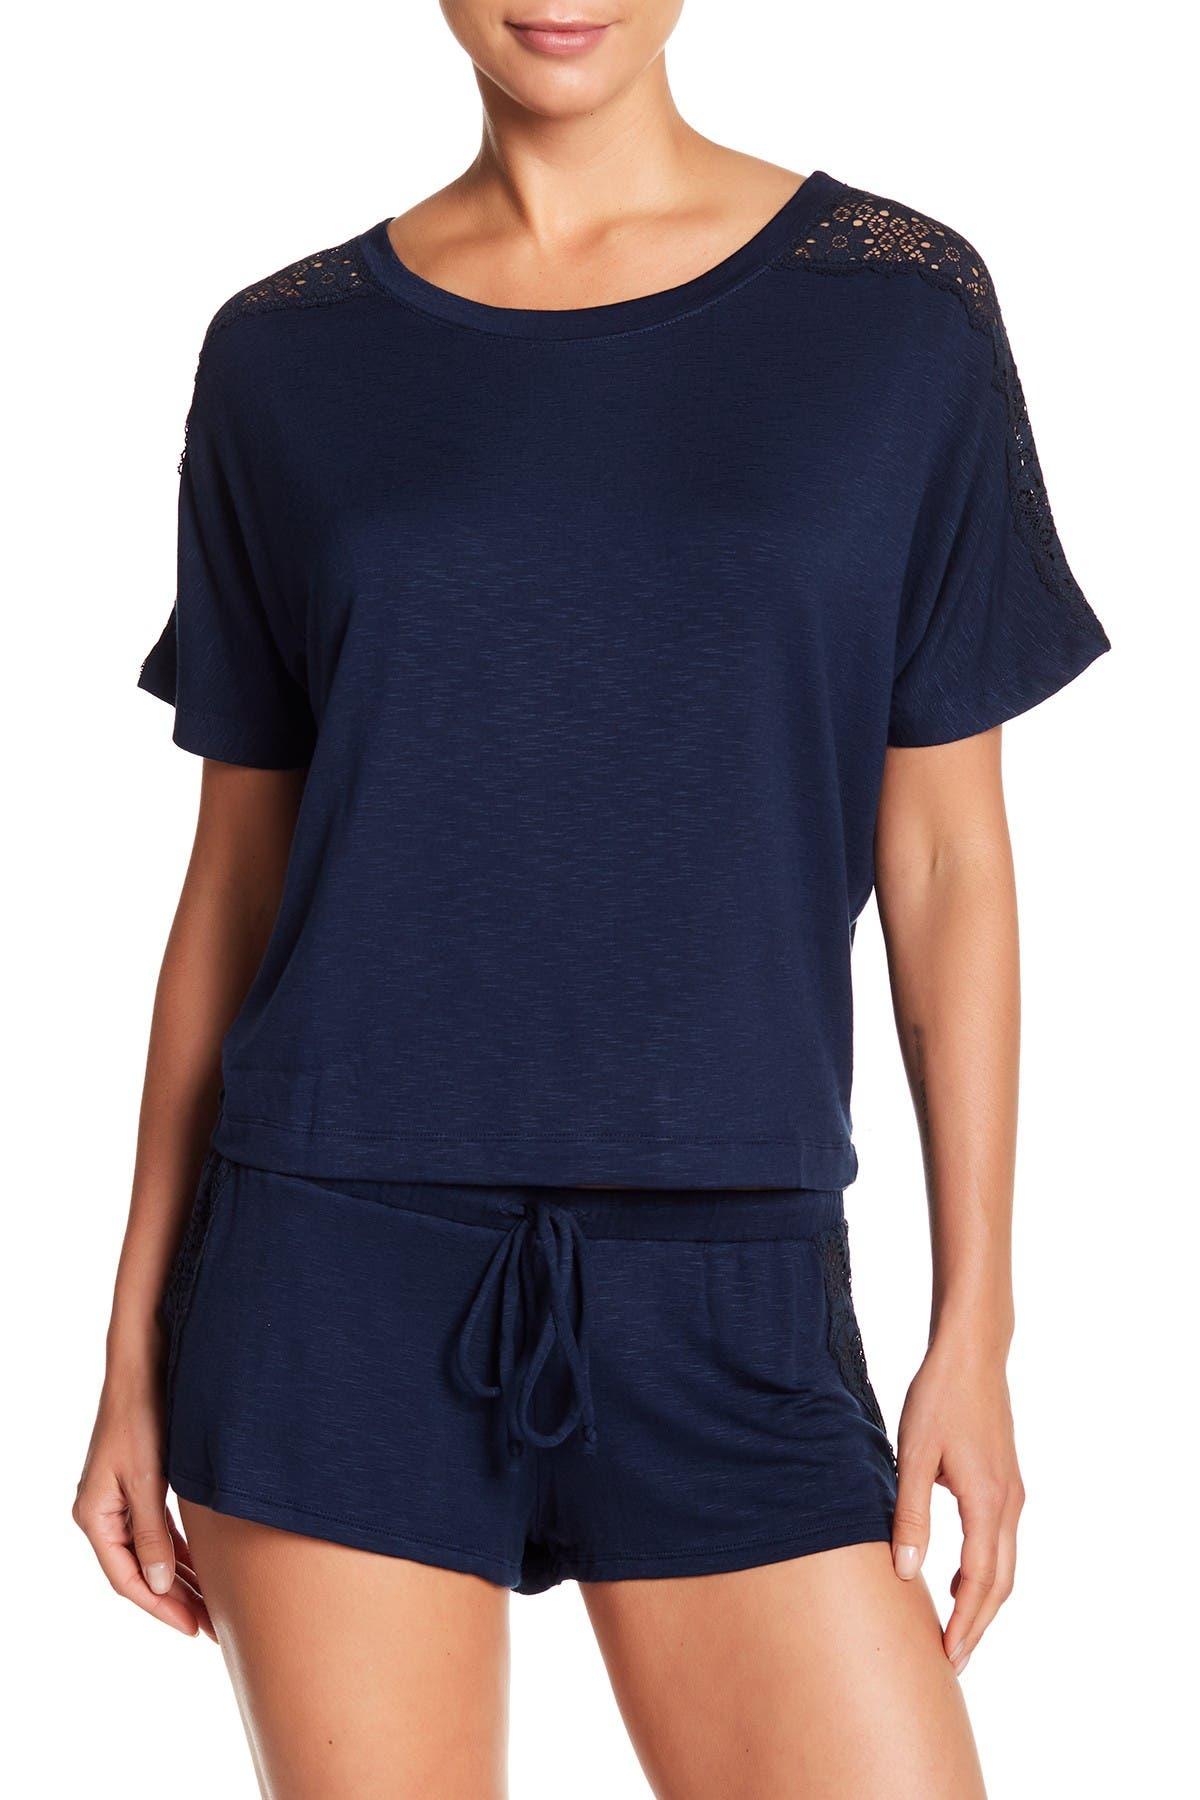 Image of Eberjey Cara Lace Shoulder T-Shirt